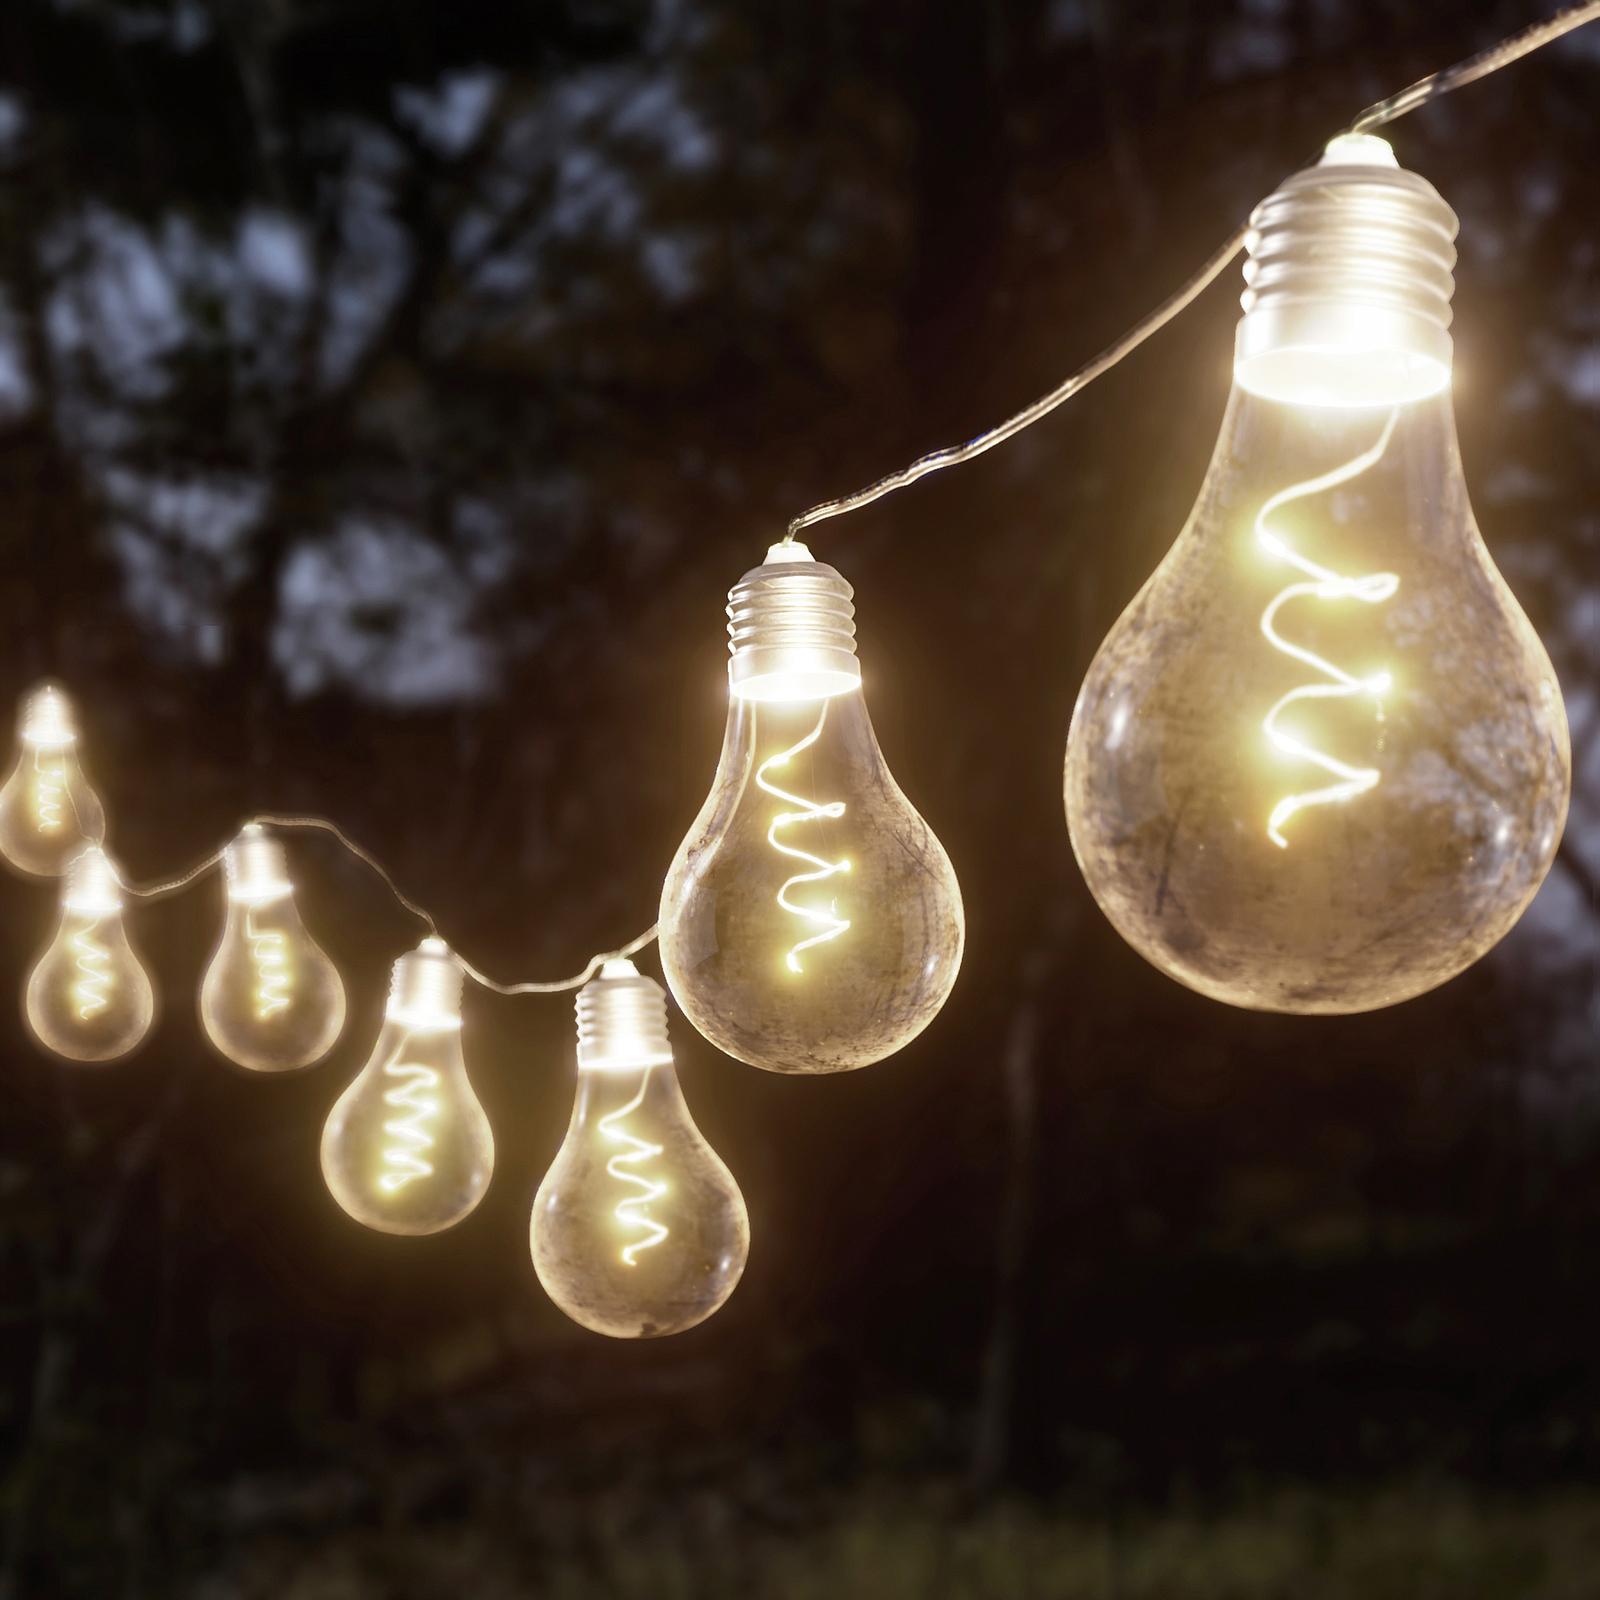 Lindby Lampini łańcuch świetlny solarny LED